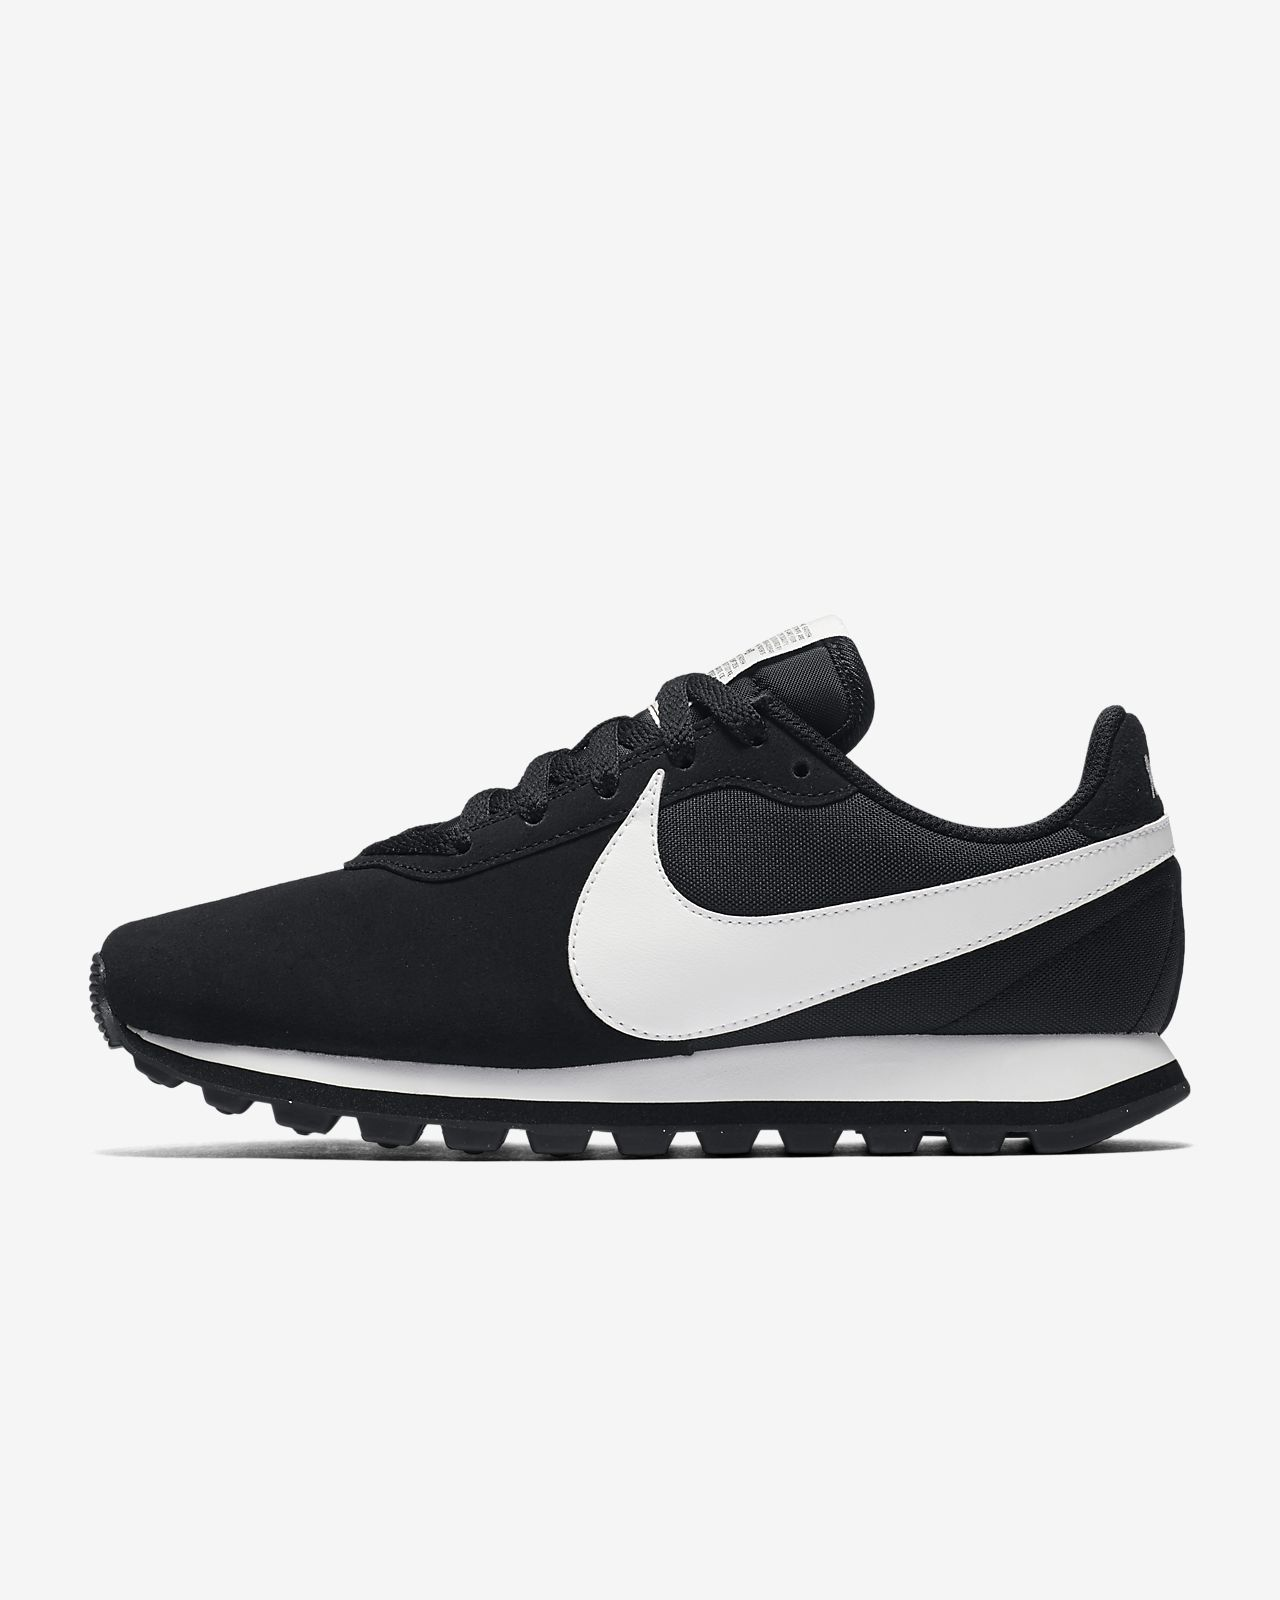 Nike Pre-Love O.X. Sko för kvinnor